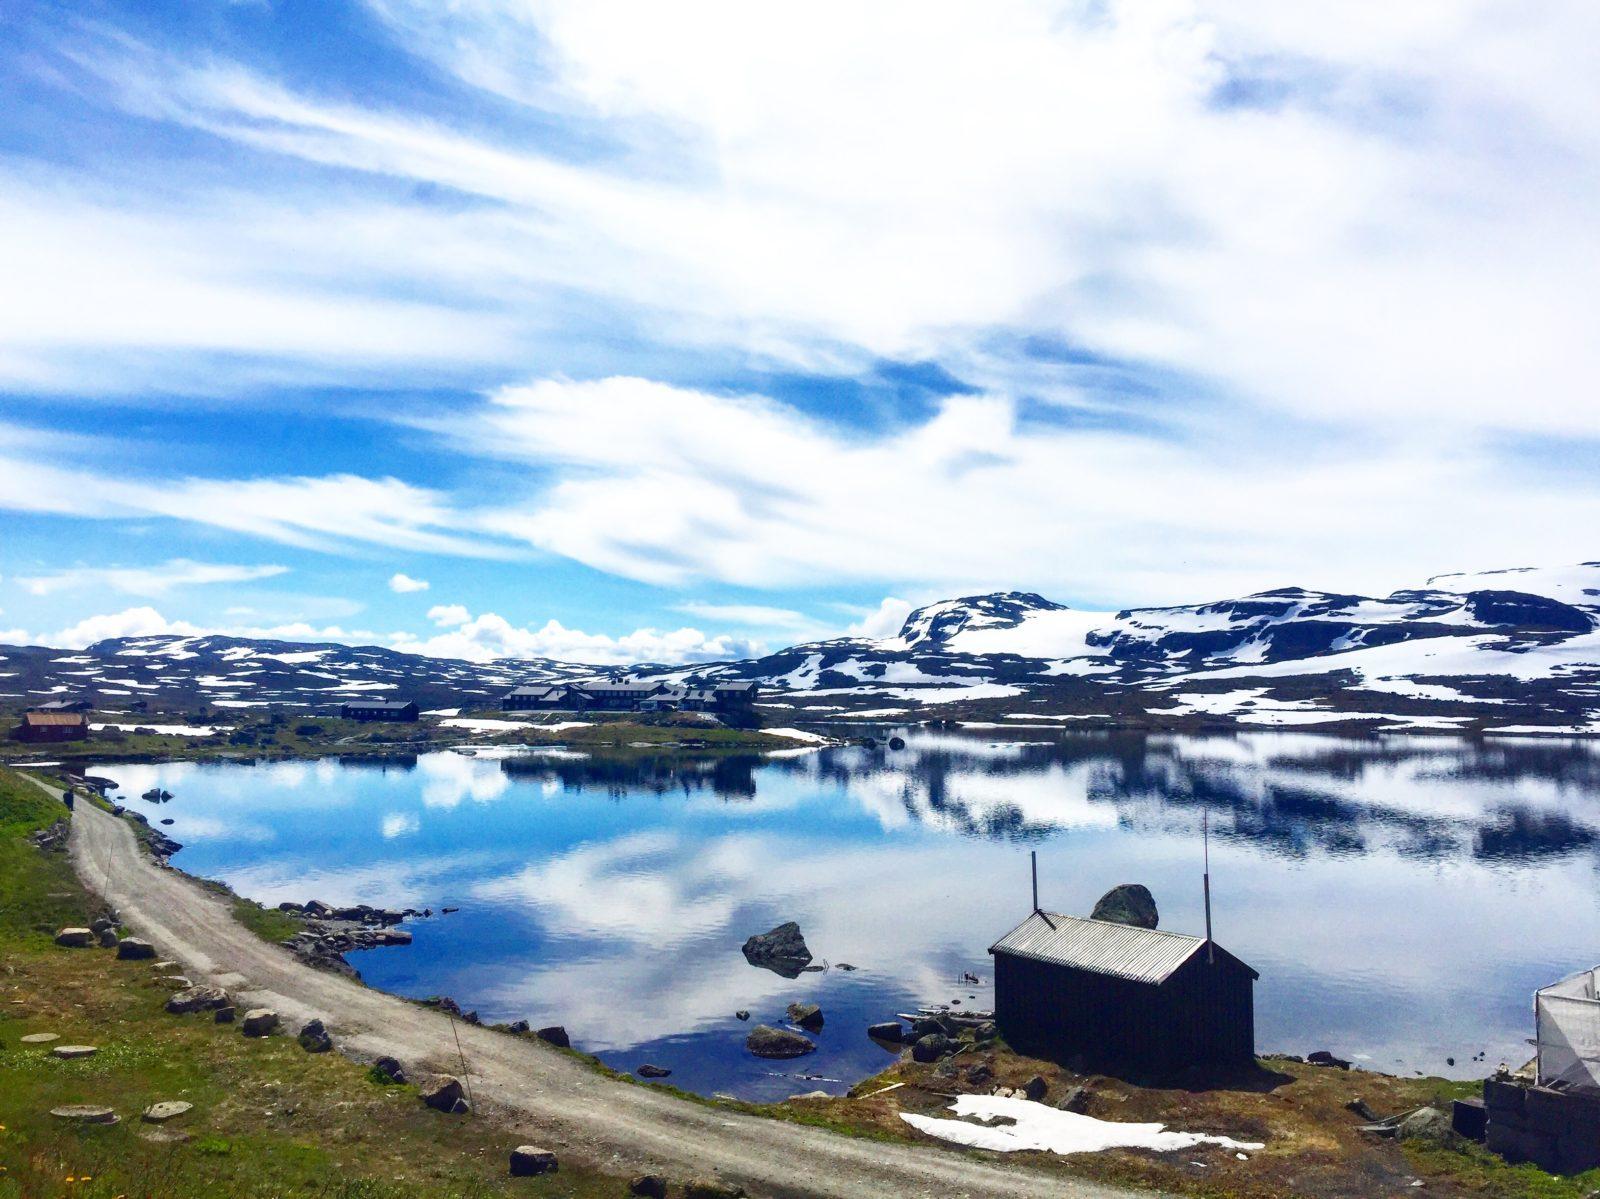 Train journey from Oslo to Flåm